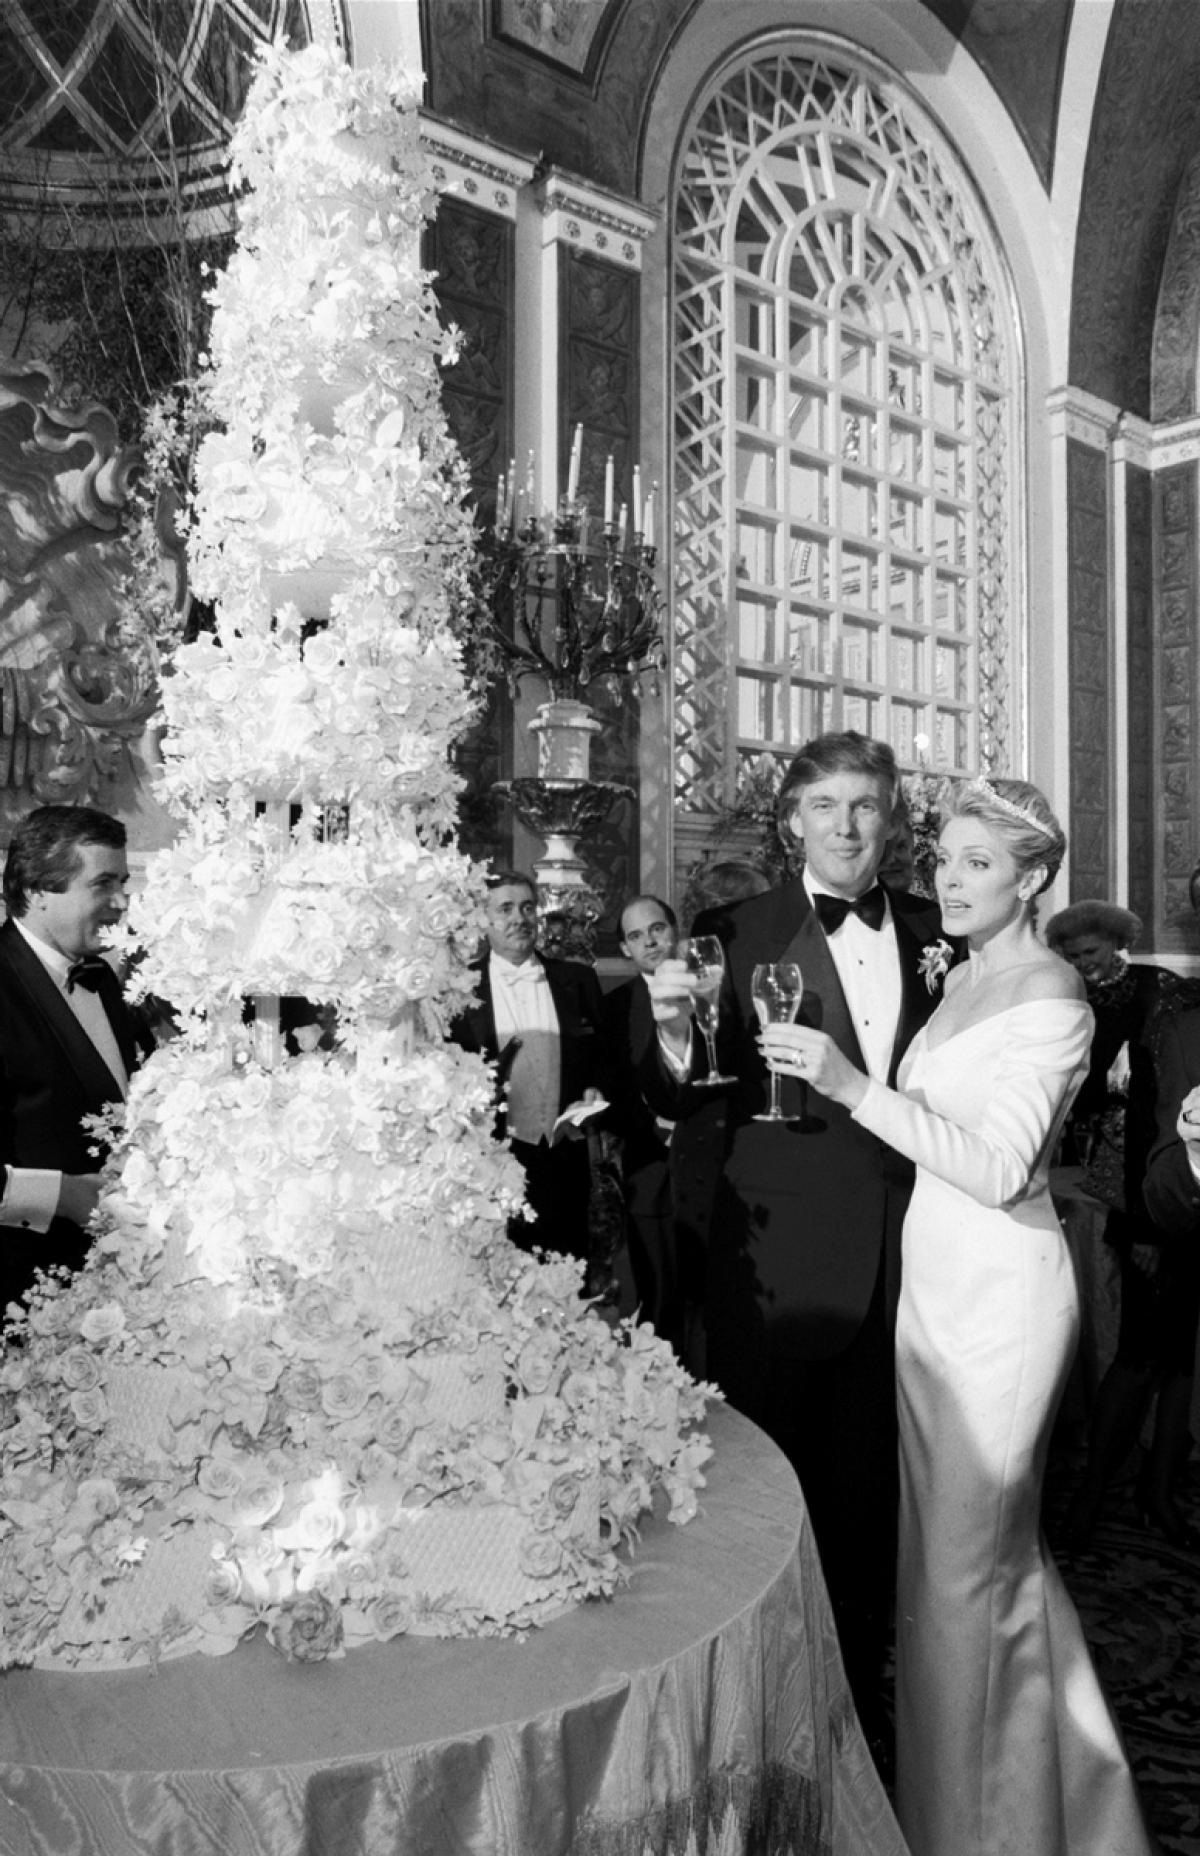 Donald Trump Marla Maples. Plaza Hotel Grand Ballroom